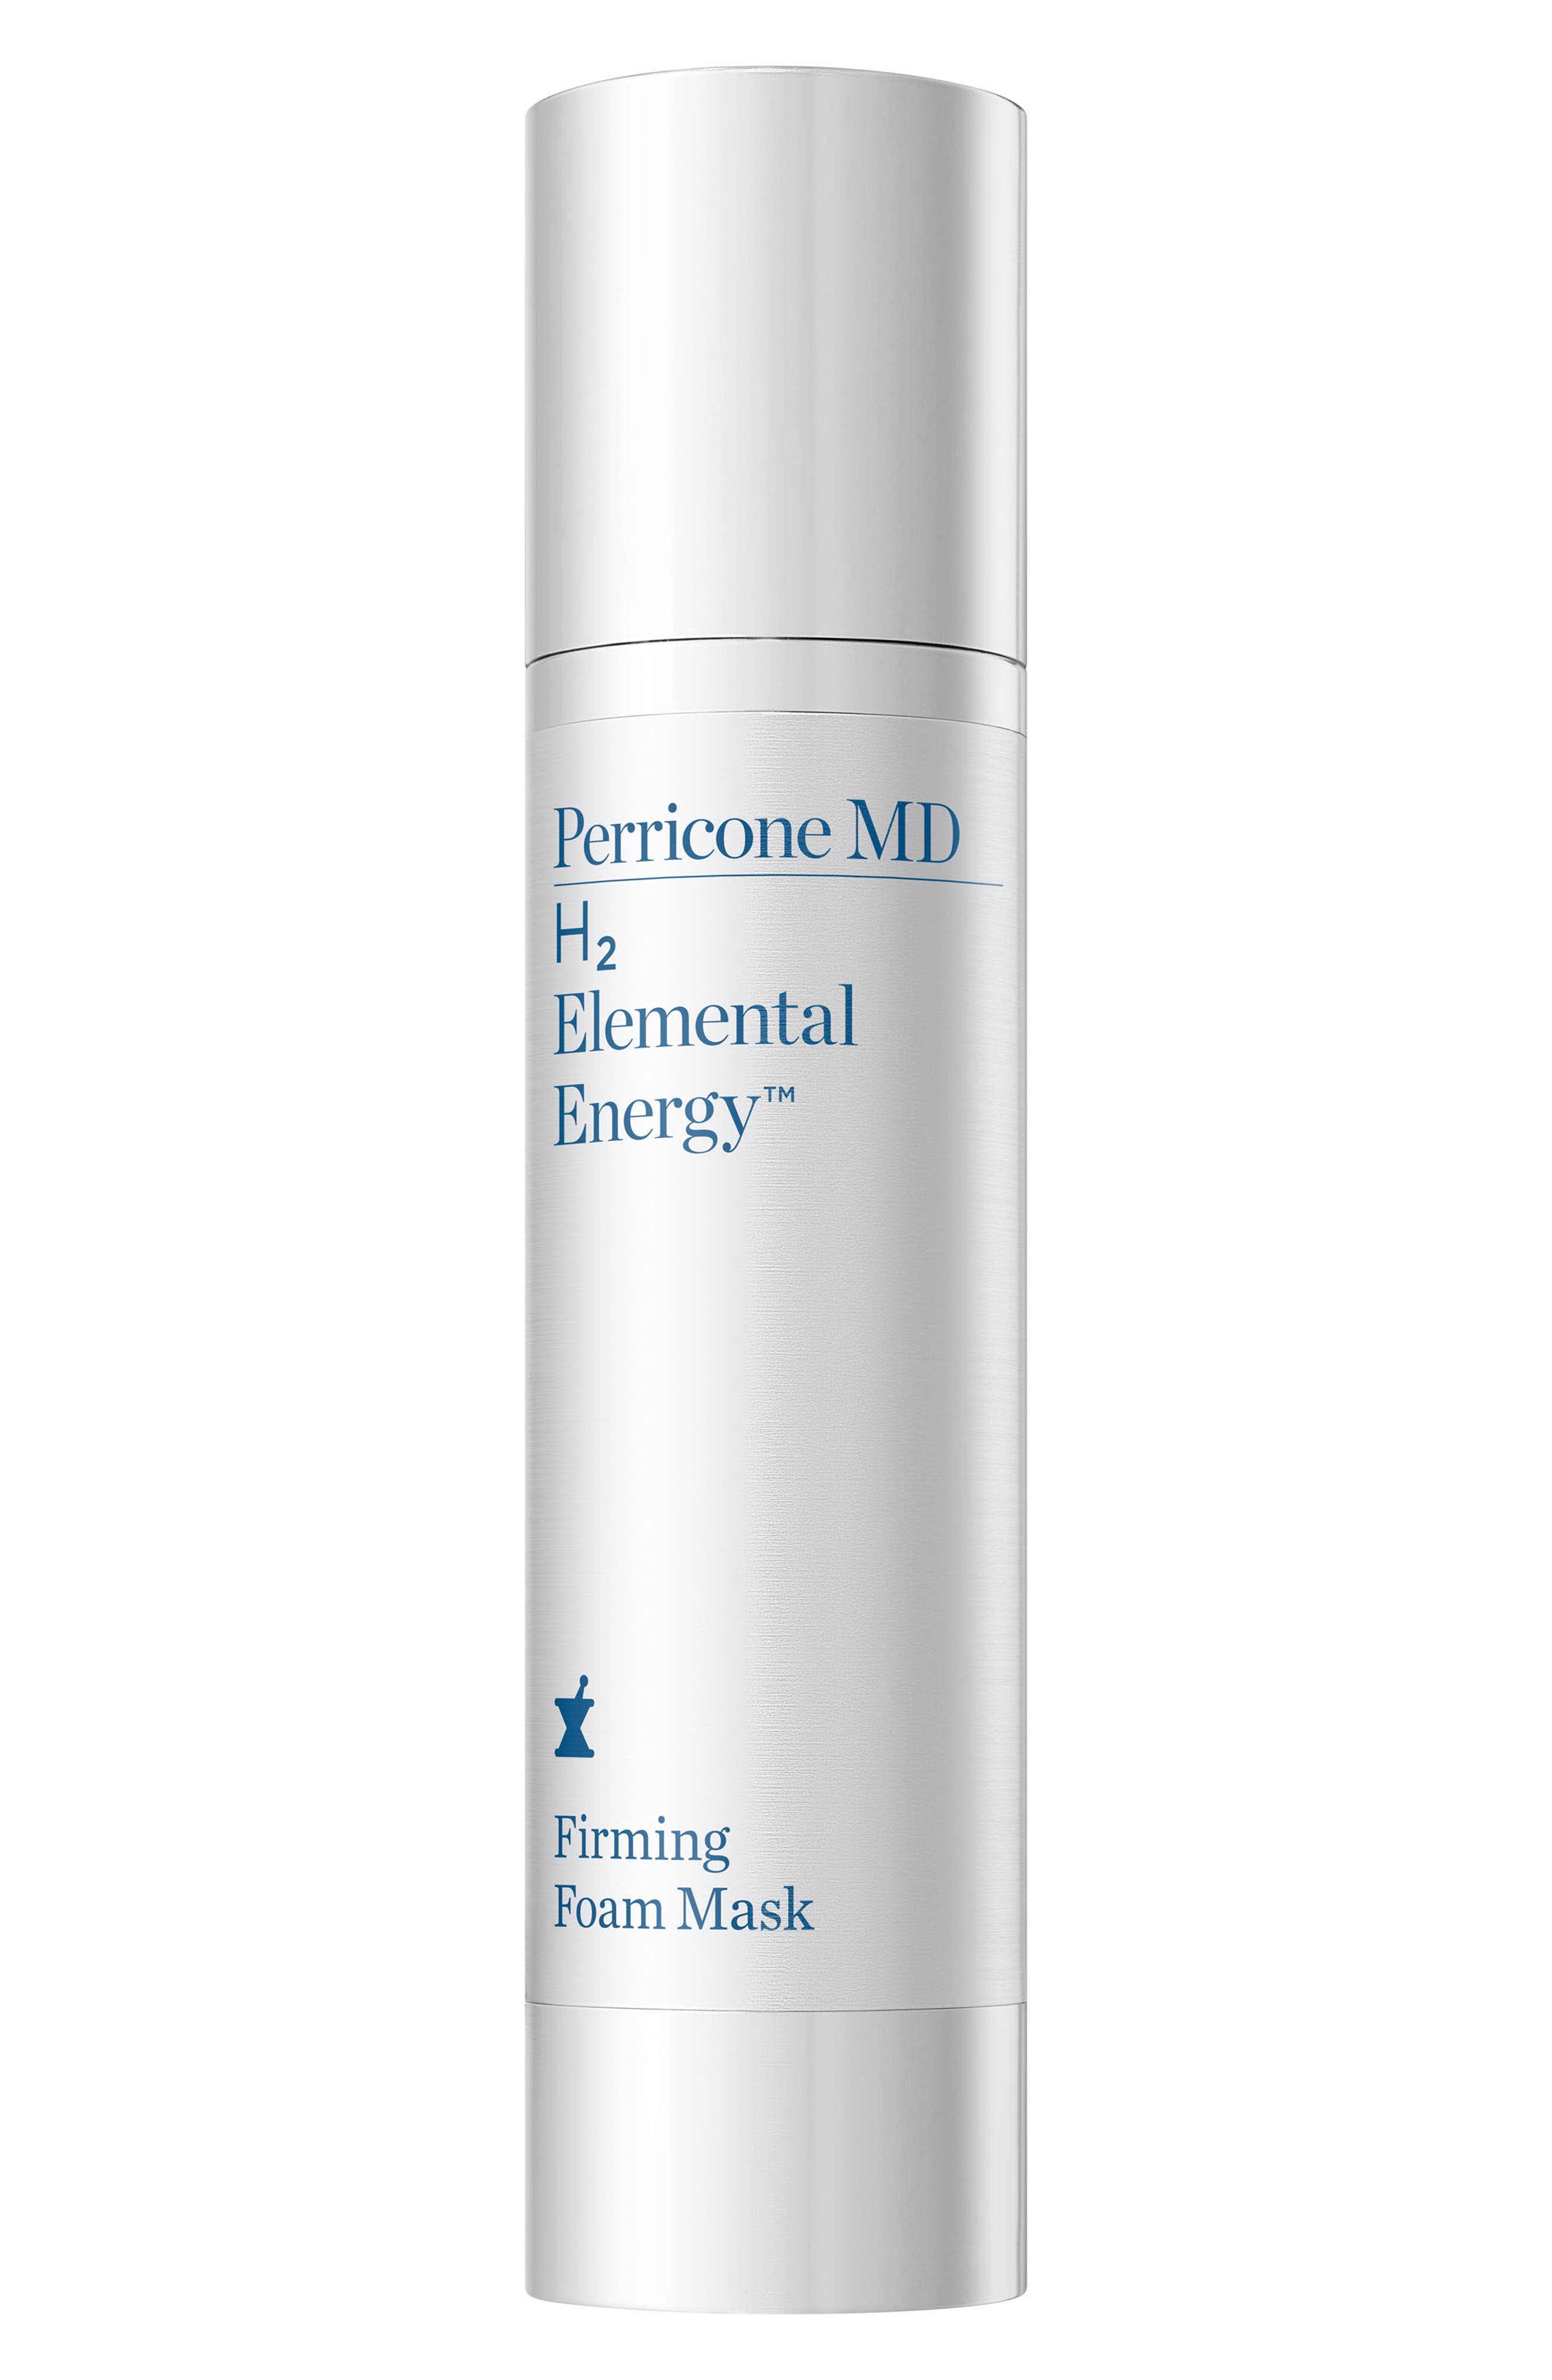 H2 Elemental Energy Firming Foam Mask,                             Main thumbnail 1, color,                             000